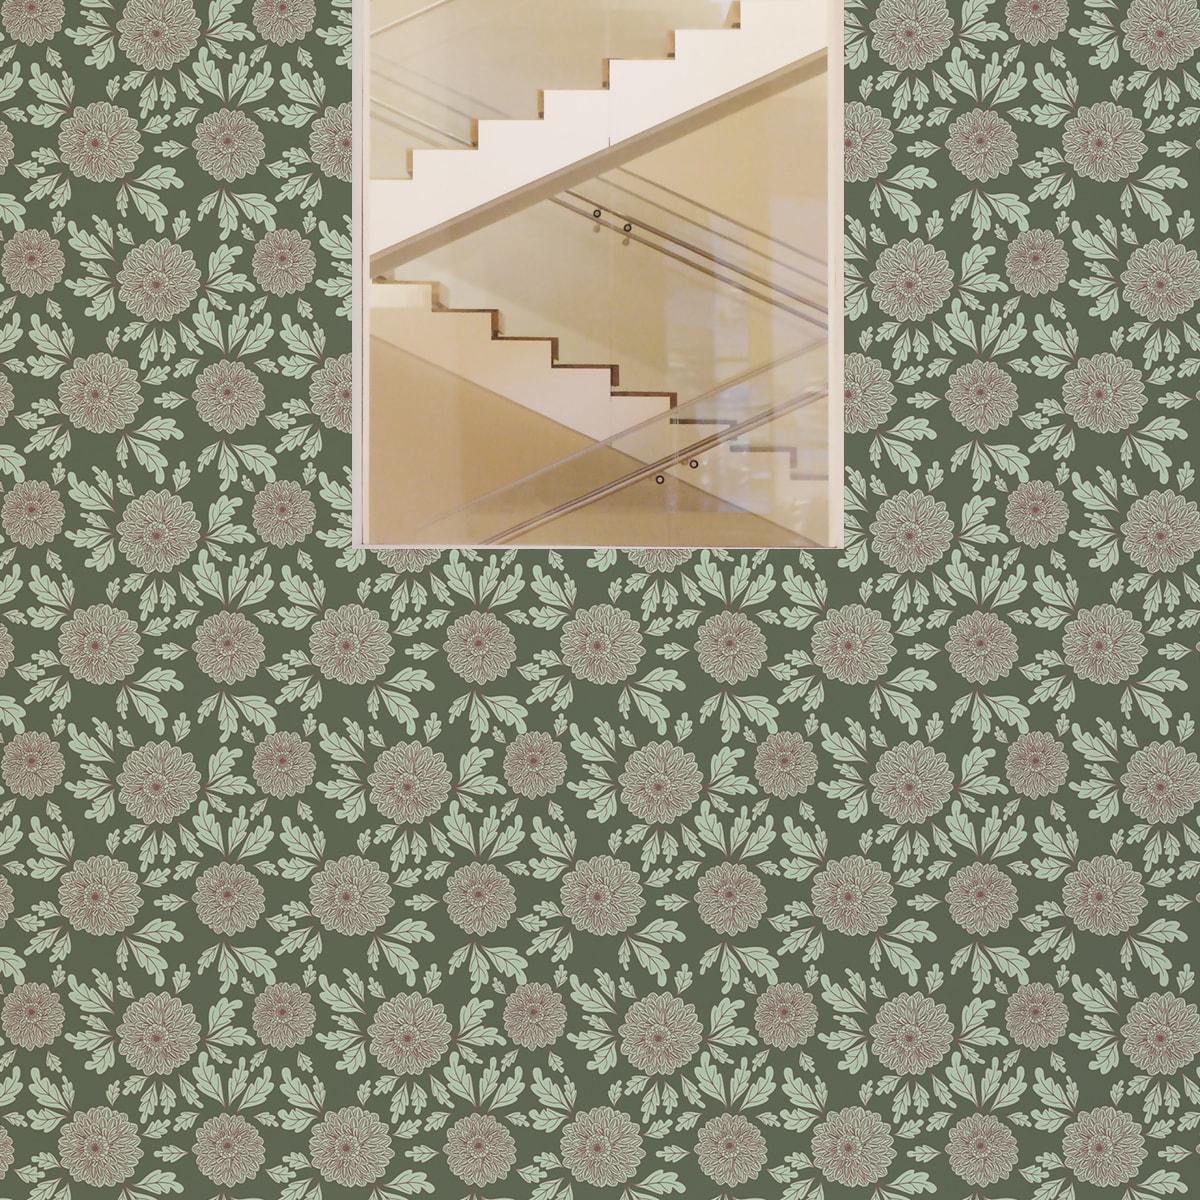 Wandtapete dunkel grün: Eleganter Tapeten Klassiker grün